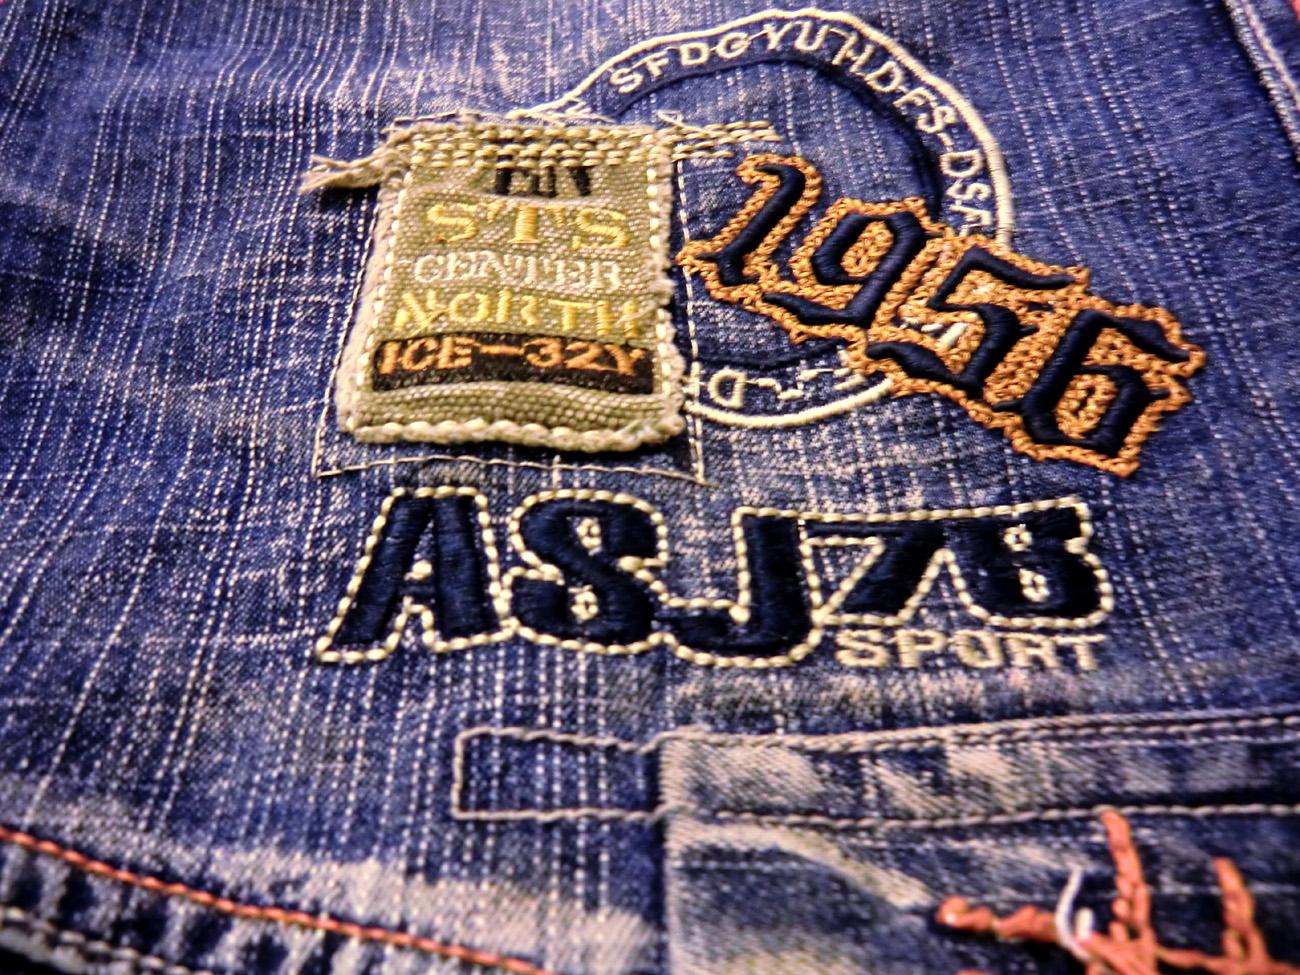 http://1.bp.blogspot.com/-lzuiFRip3B8/TuiAtvJMMlI/AAAAAAAAY8k/Lr0NpEE3J6Y/s1600/Gruge+Jeans+Wallpapers+%25282%2529.jpg